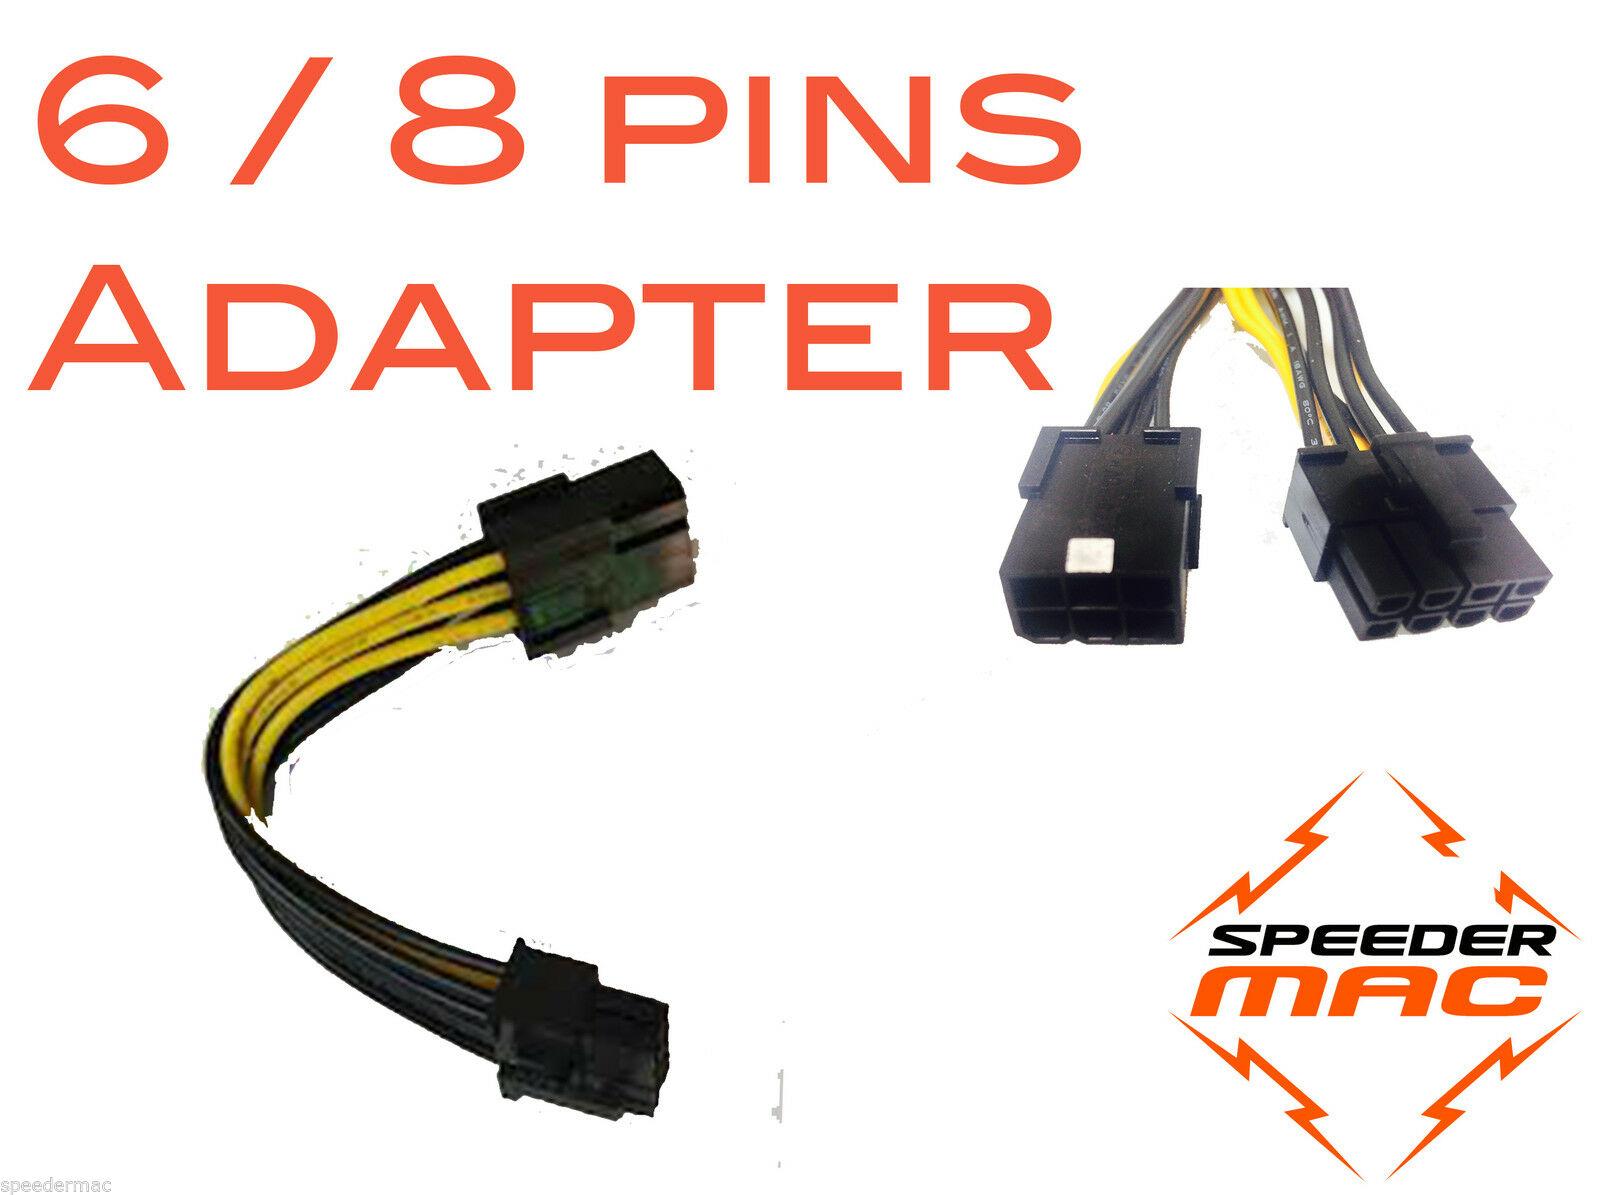 mac pro PCIe 6 pin til PCIe 8 pin